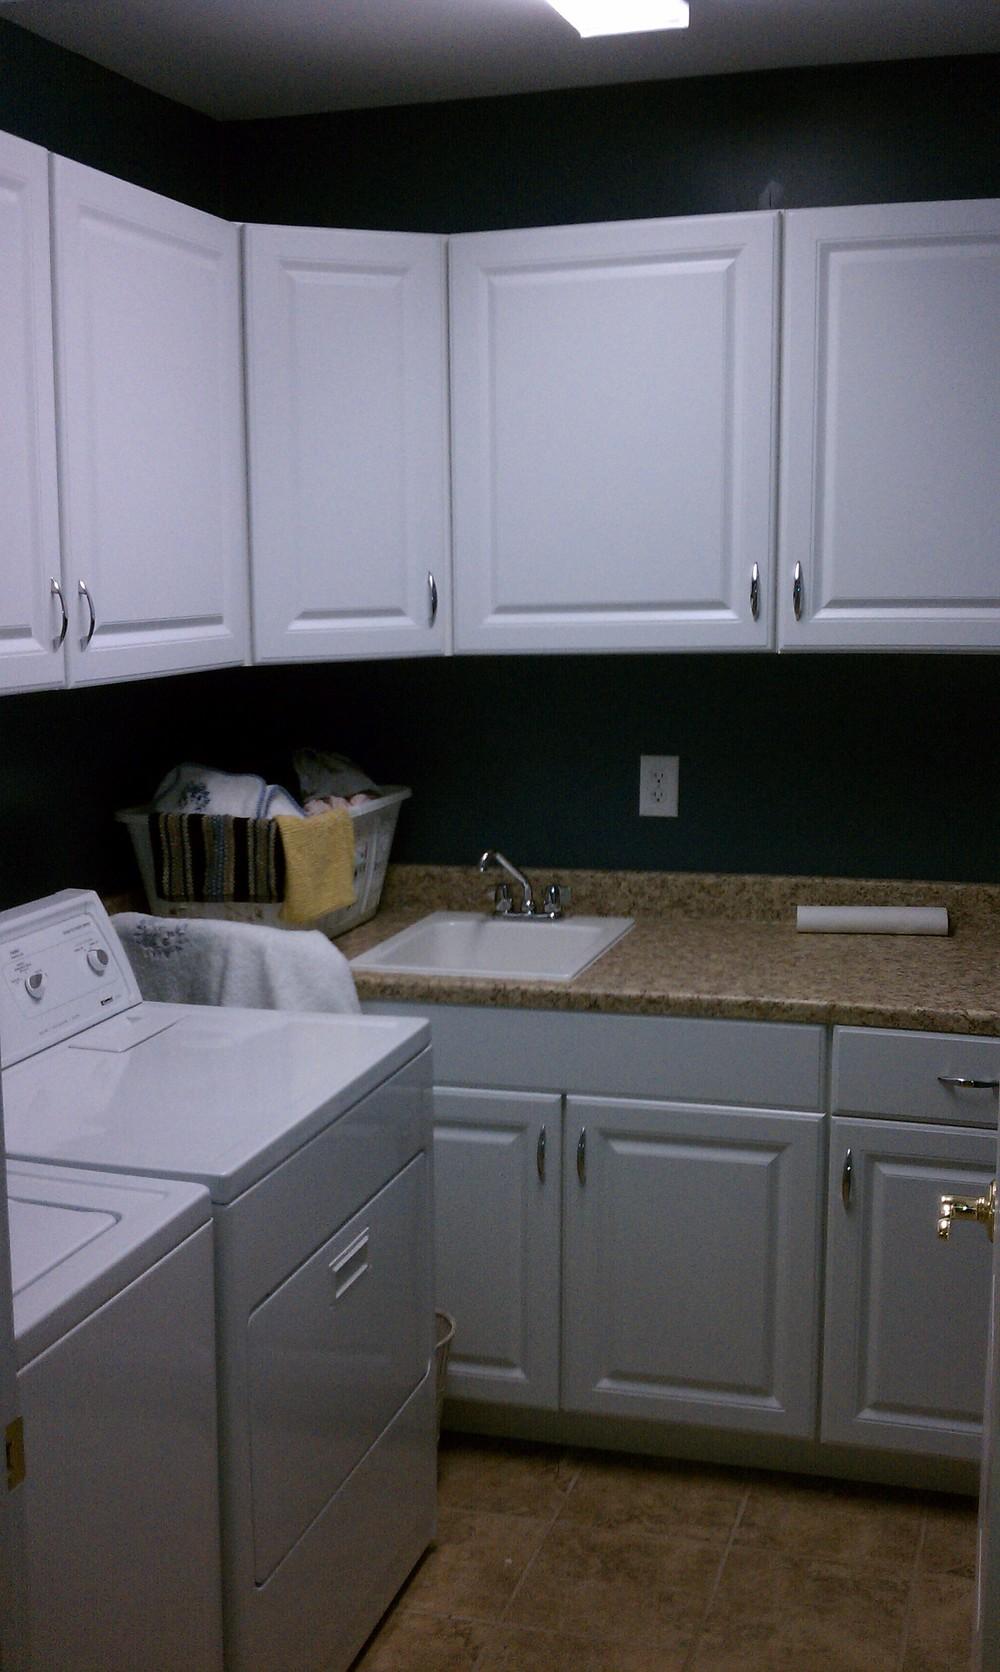 Morrow Handyman Cabinets Installation